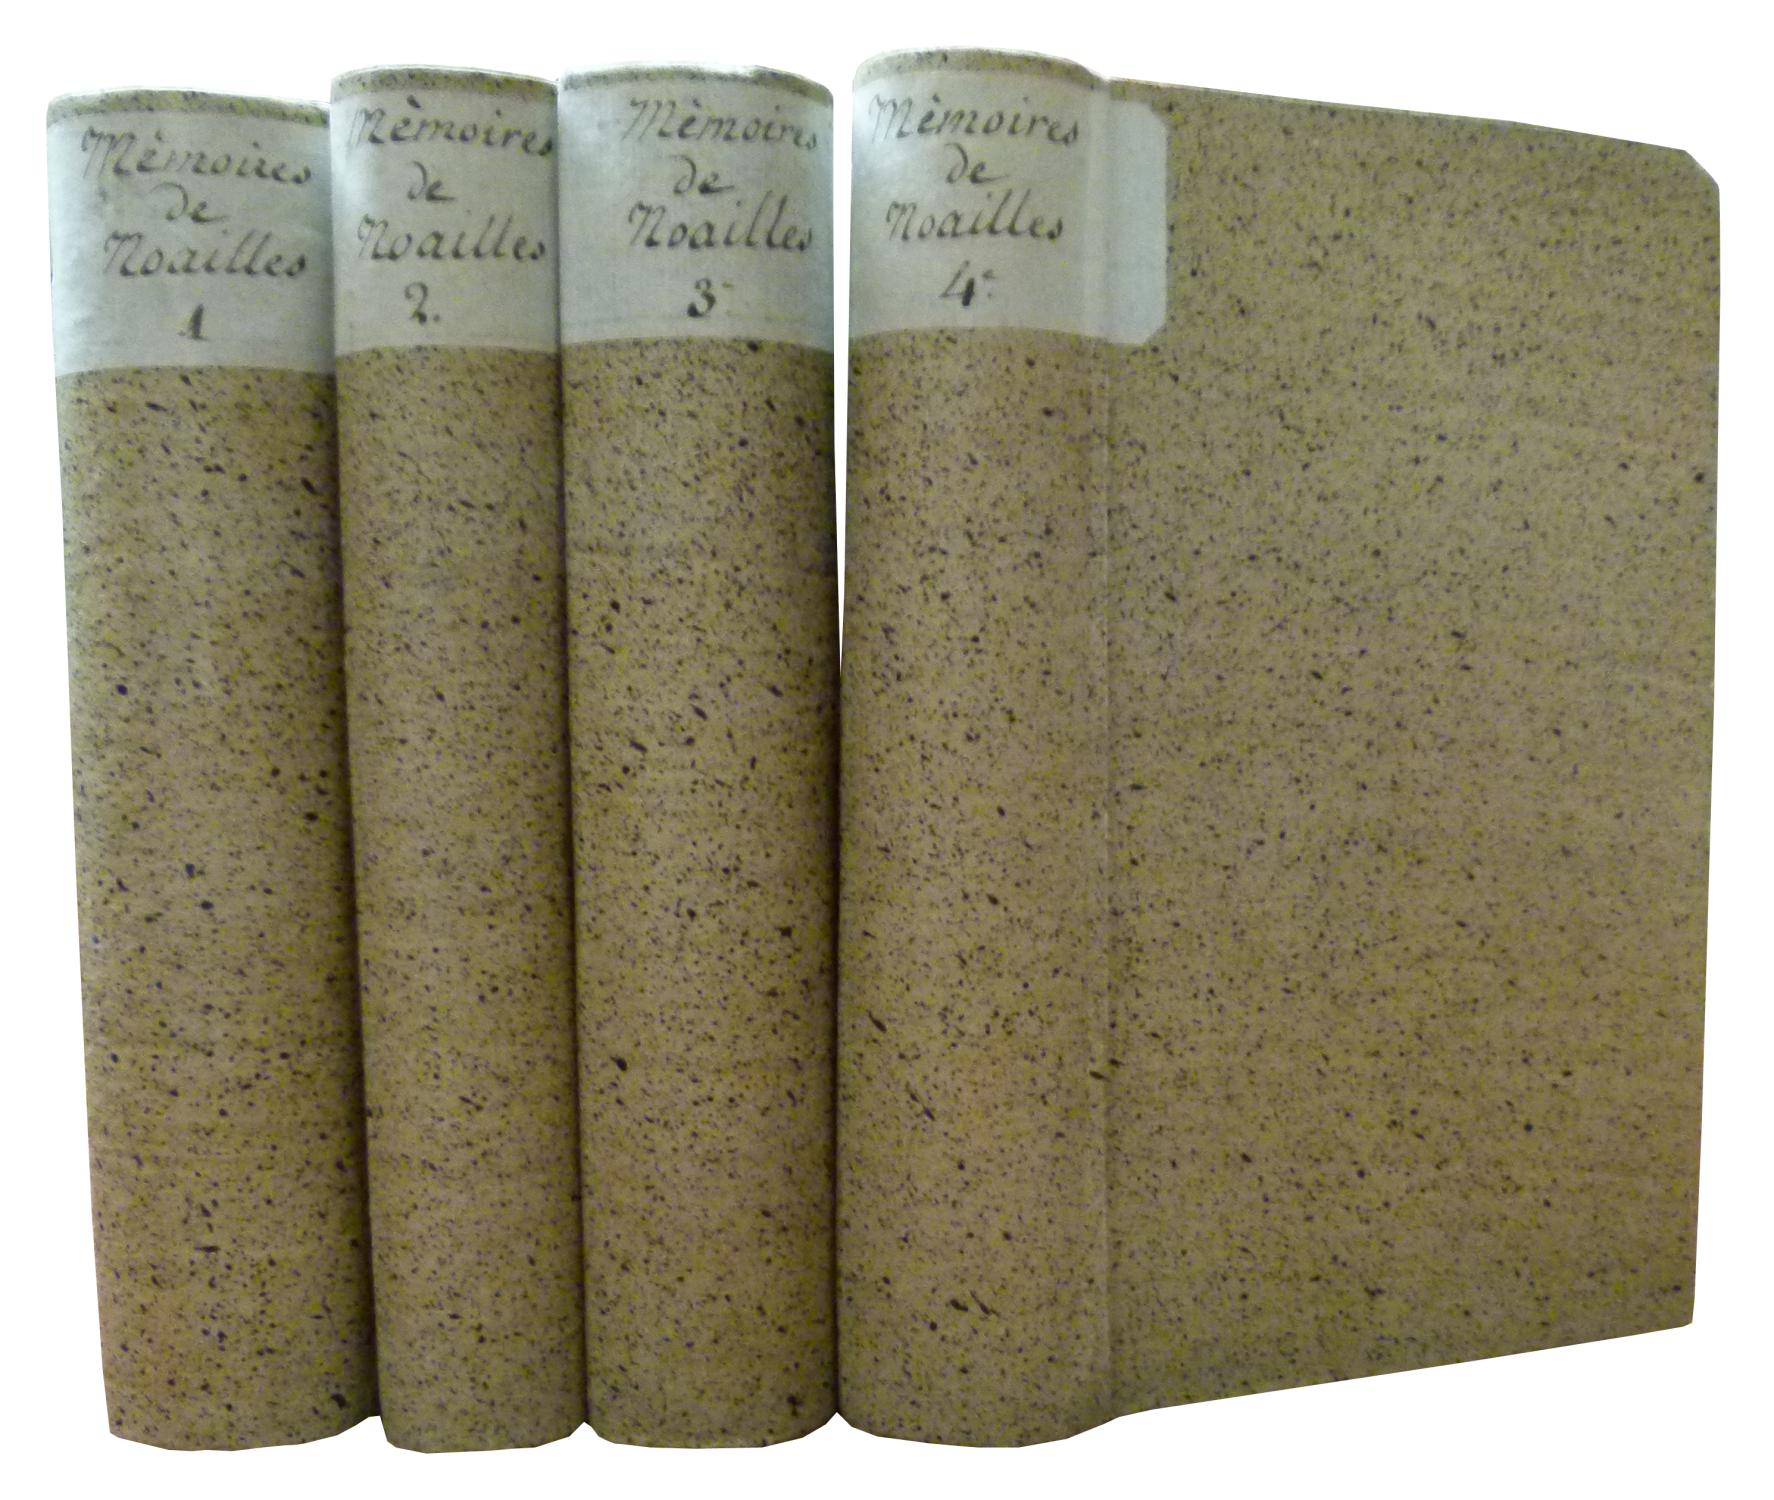 Univers Du Cuir Avis vialibri ~ rare books from 1777 - page 71